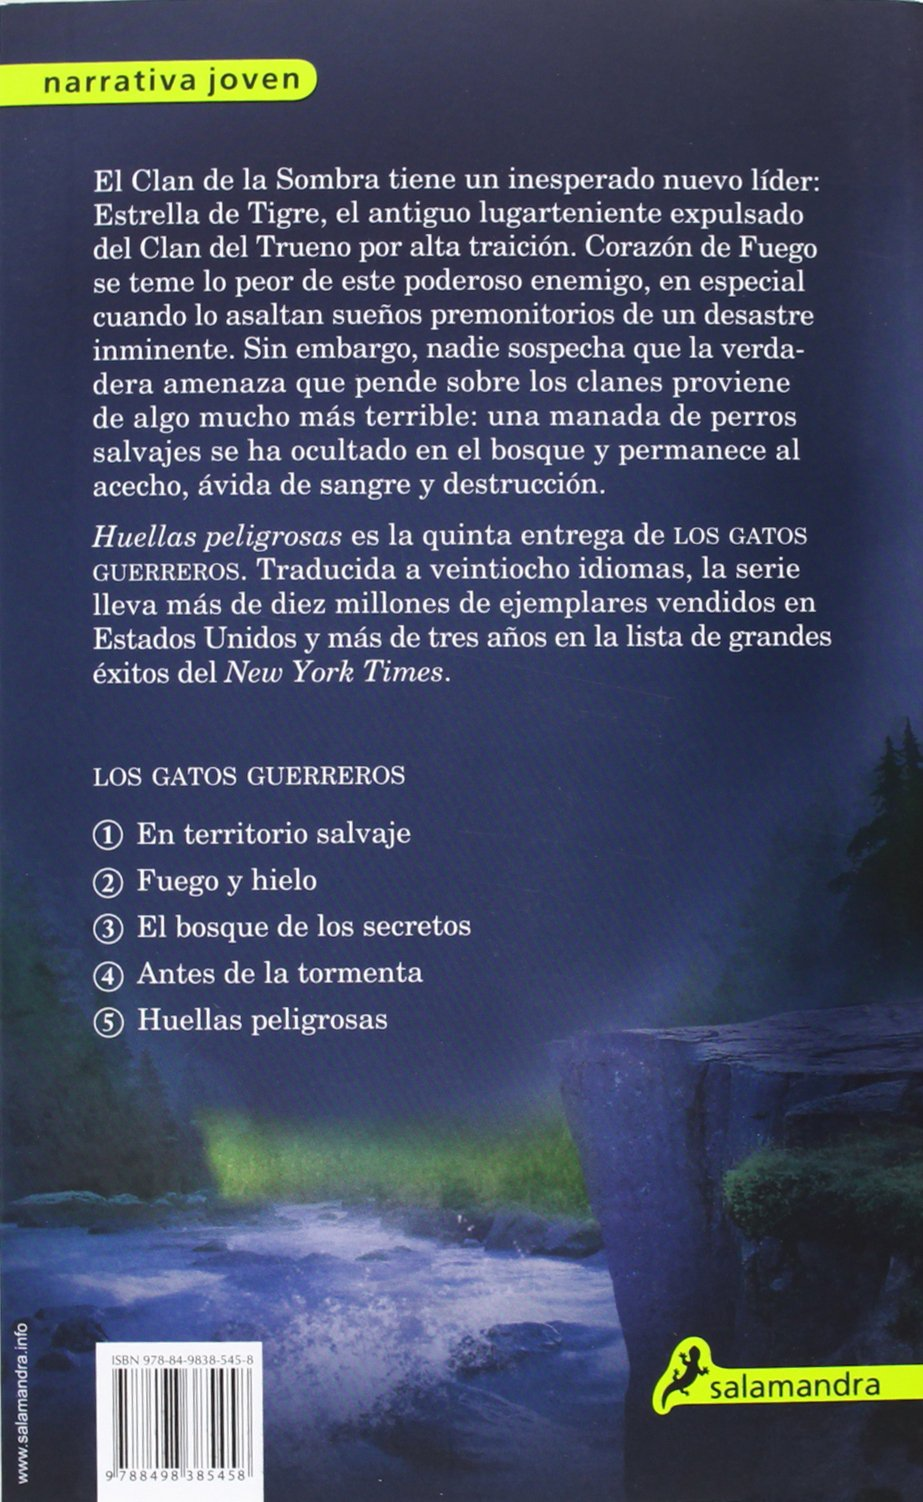 Huellas peligrosas (Gatos: Los cuatro clanes / Warriors) (Spanish Edition) (9788498385458): Erin Hunter, Salamandra: Books